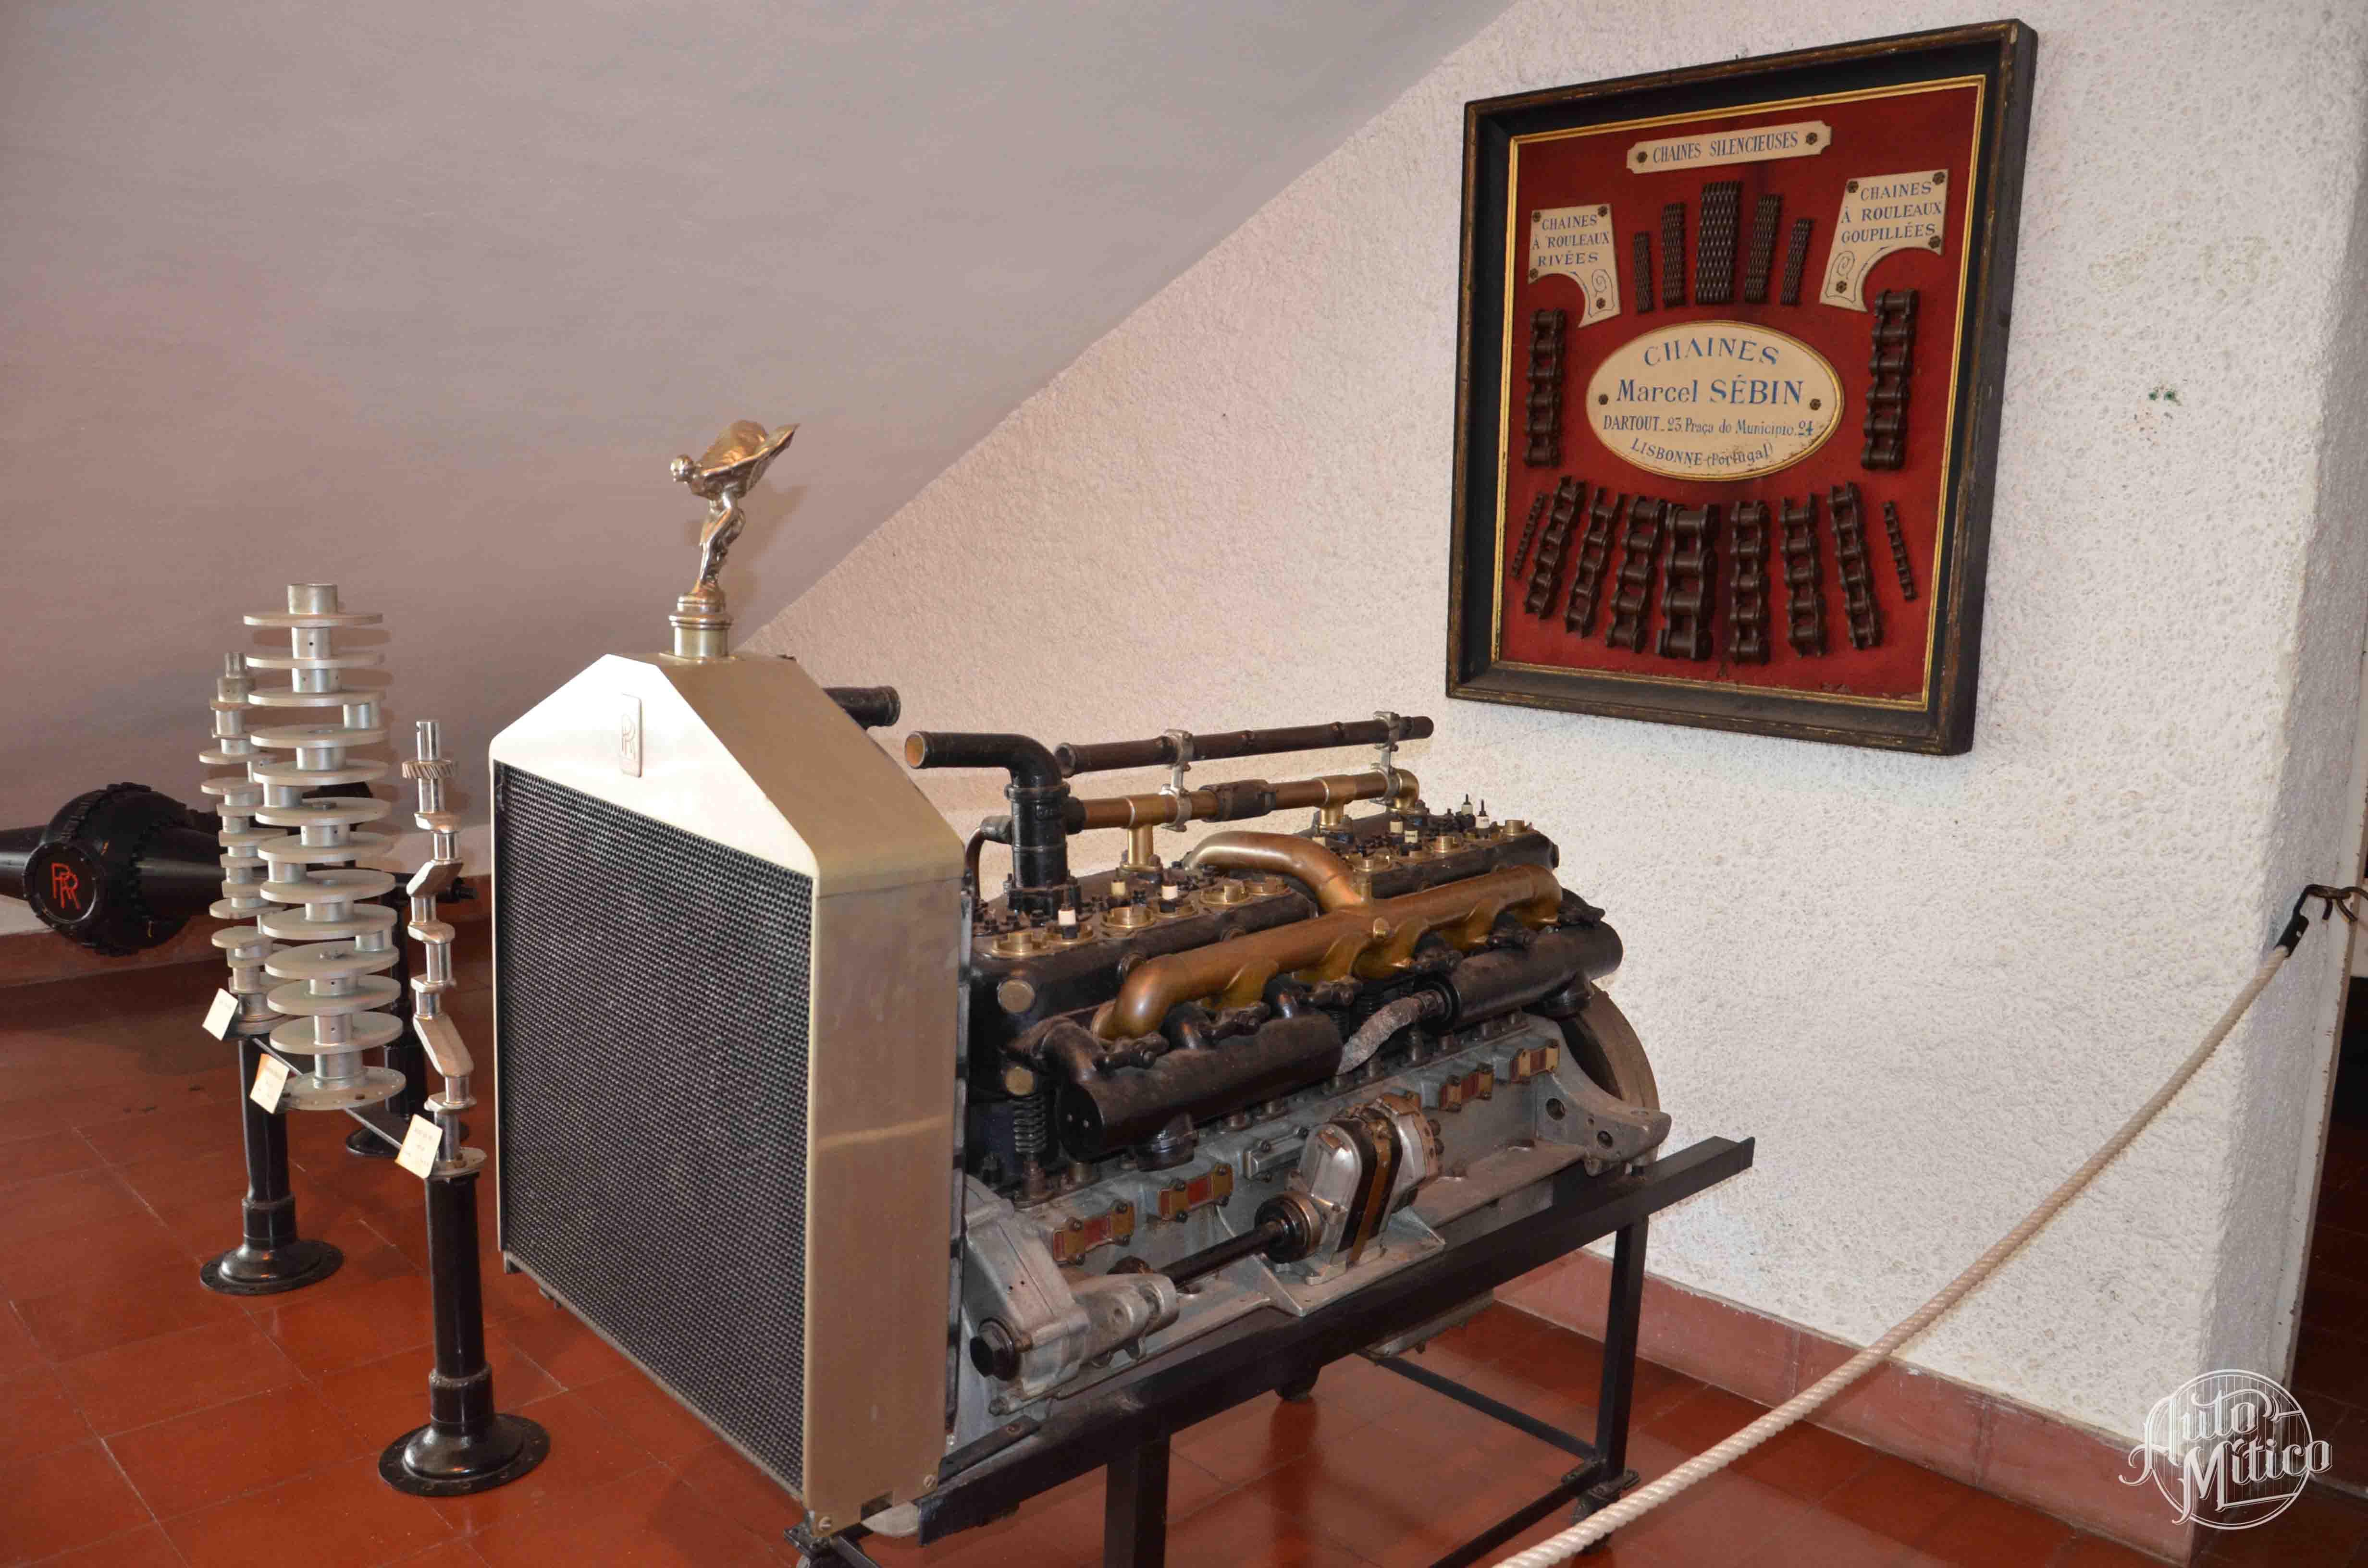 Automitico Caramulo Motor Rolls Royce